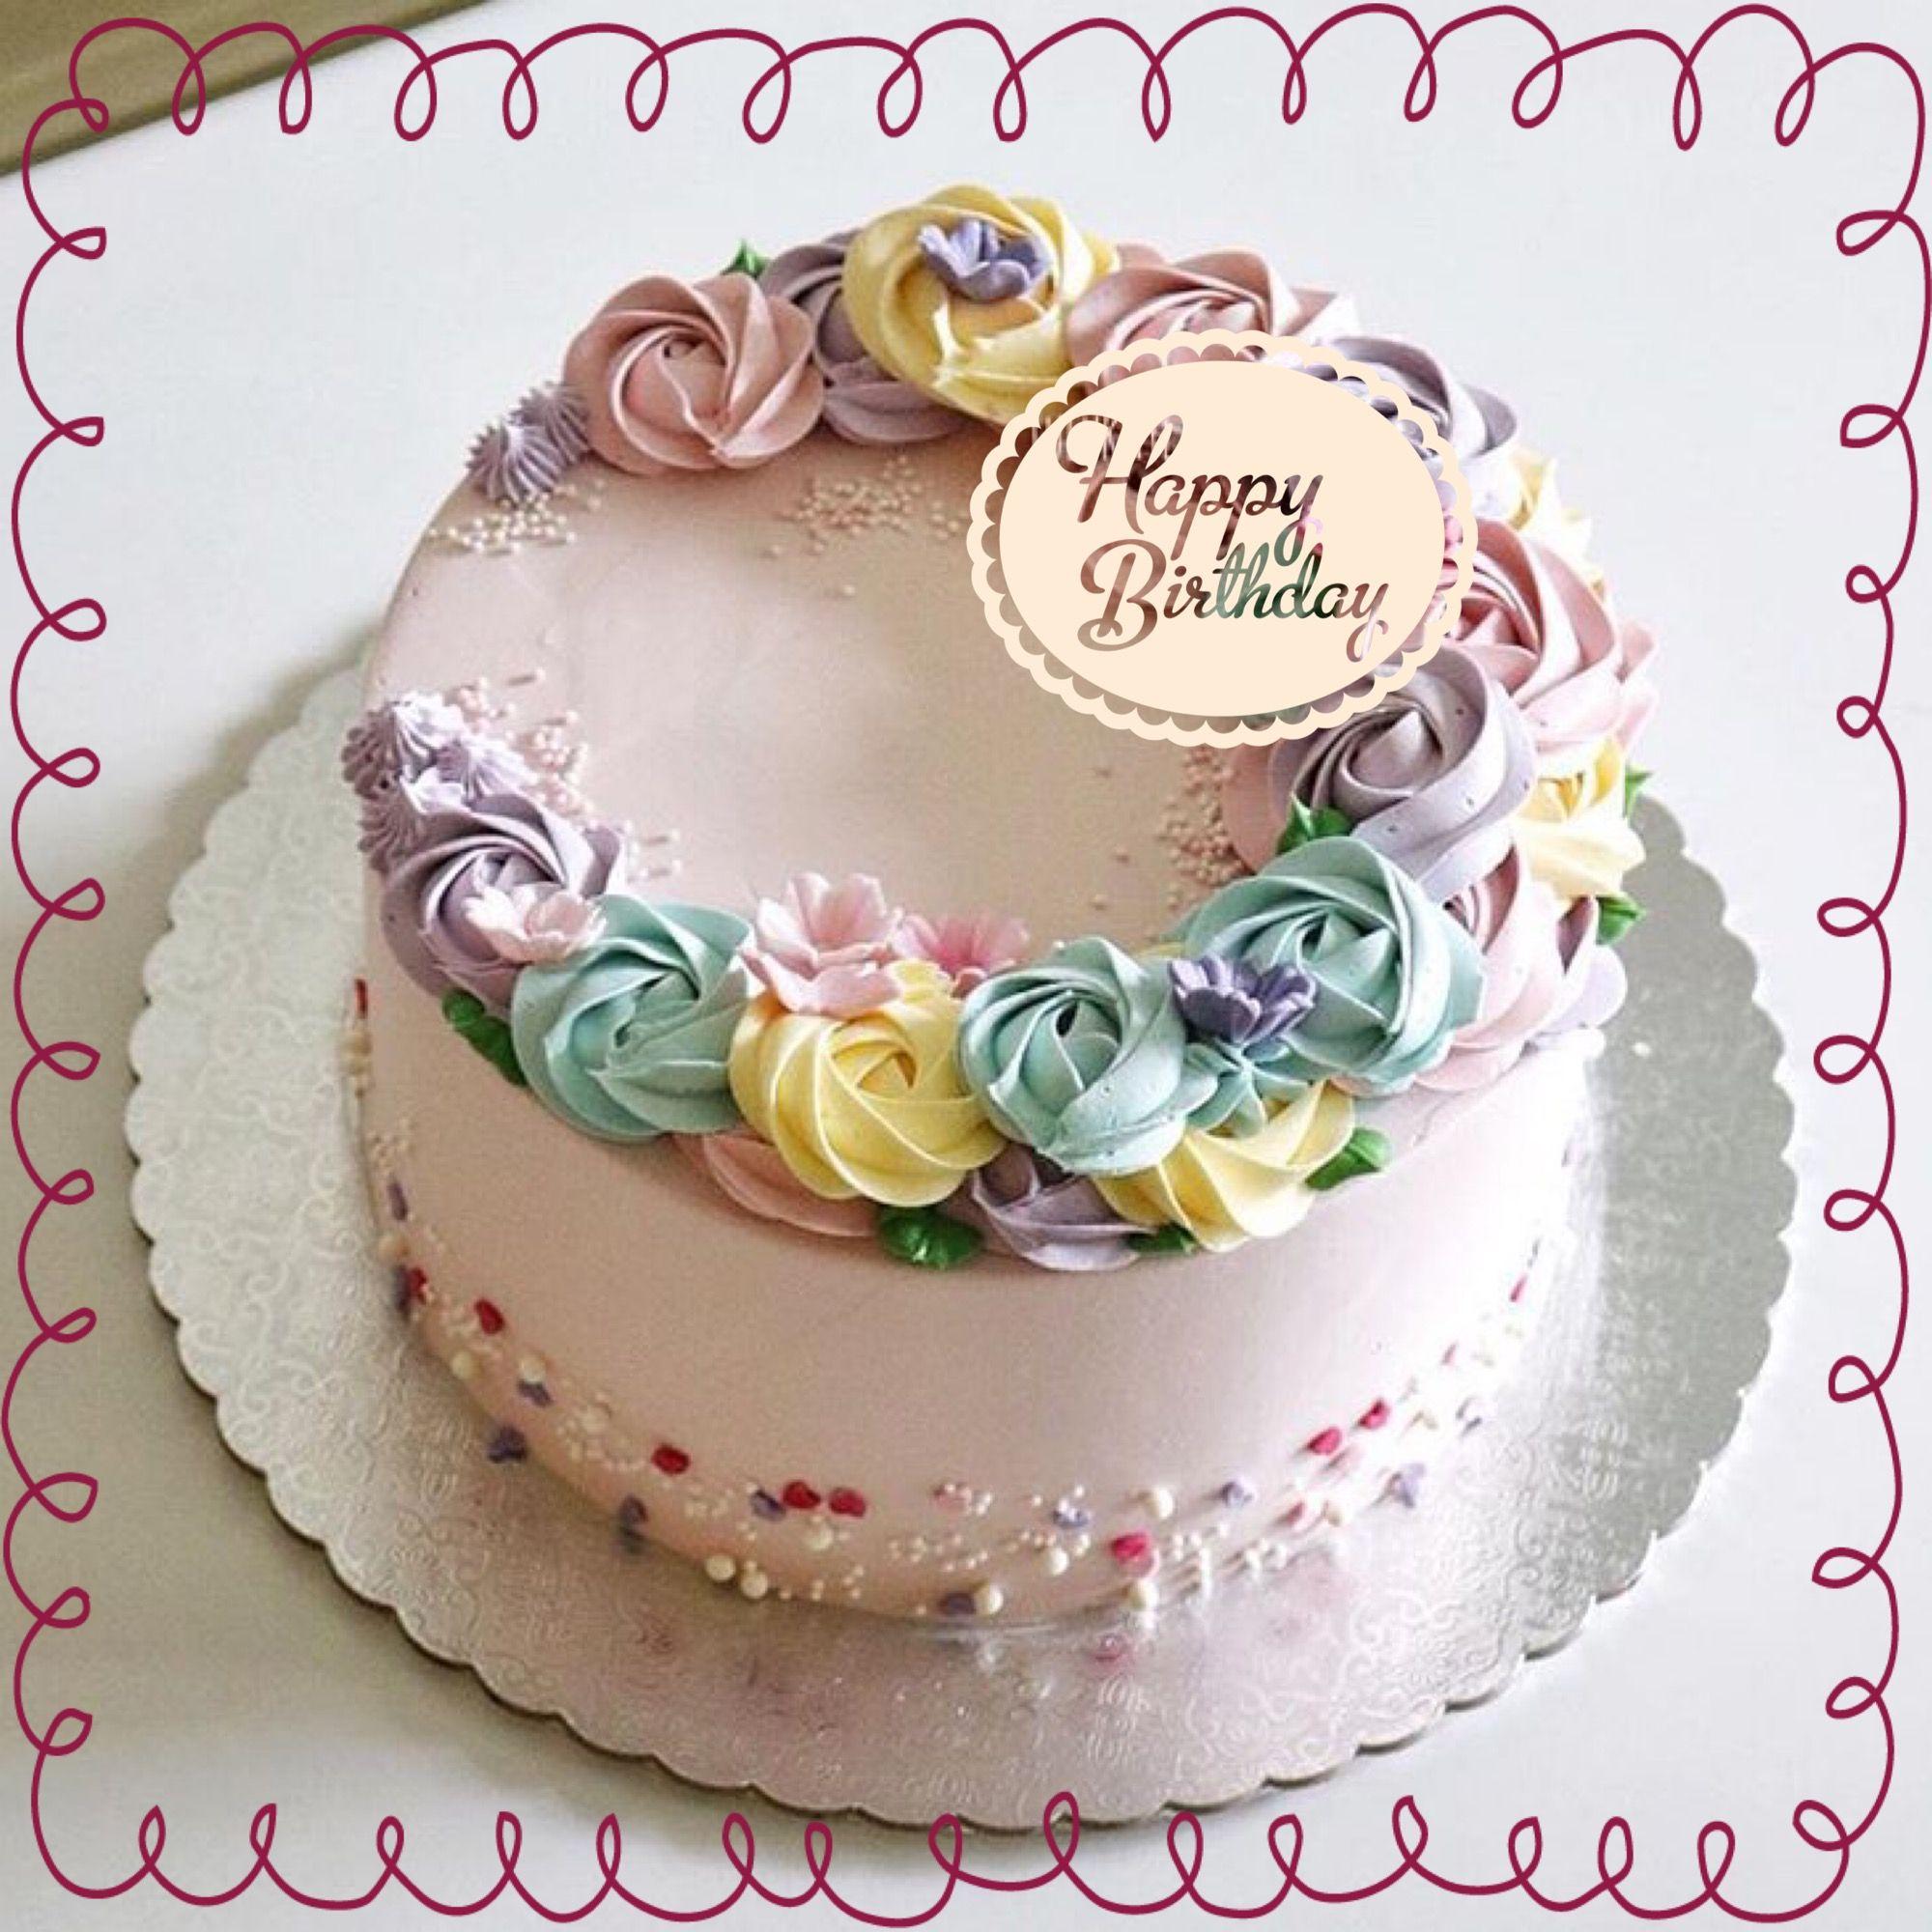 Happy Birthday Birthday Cards Birthday Cakes Flowers